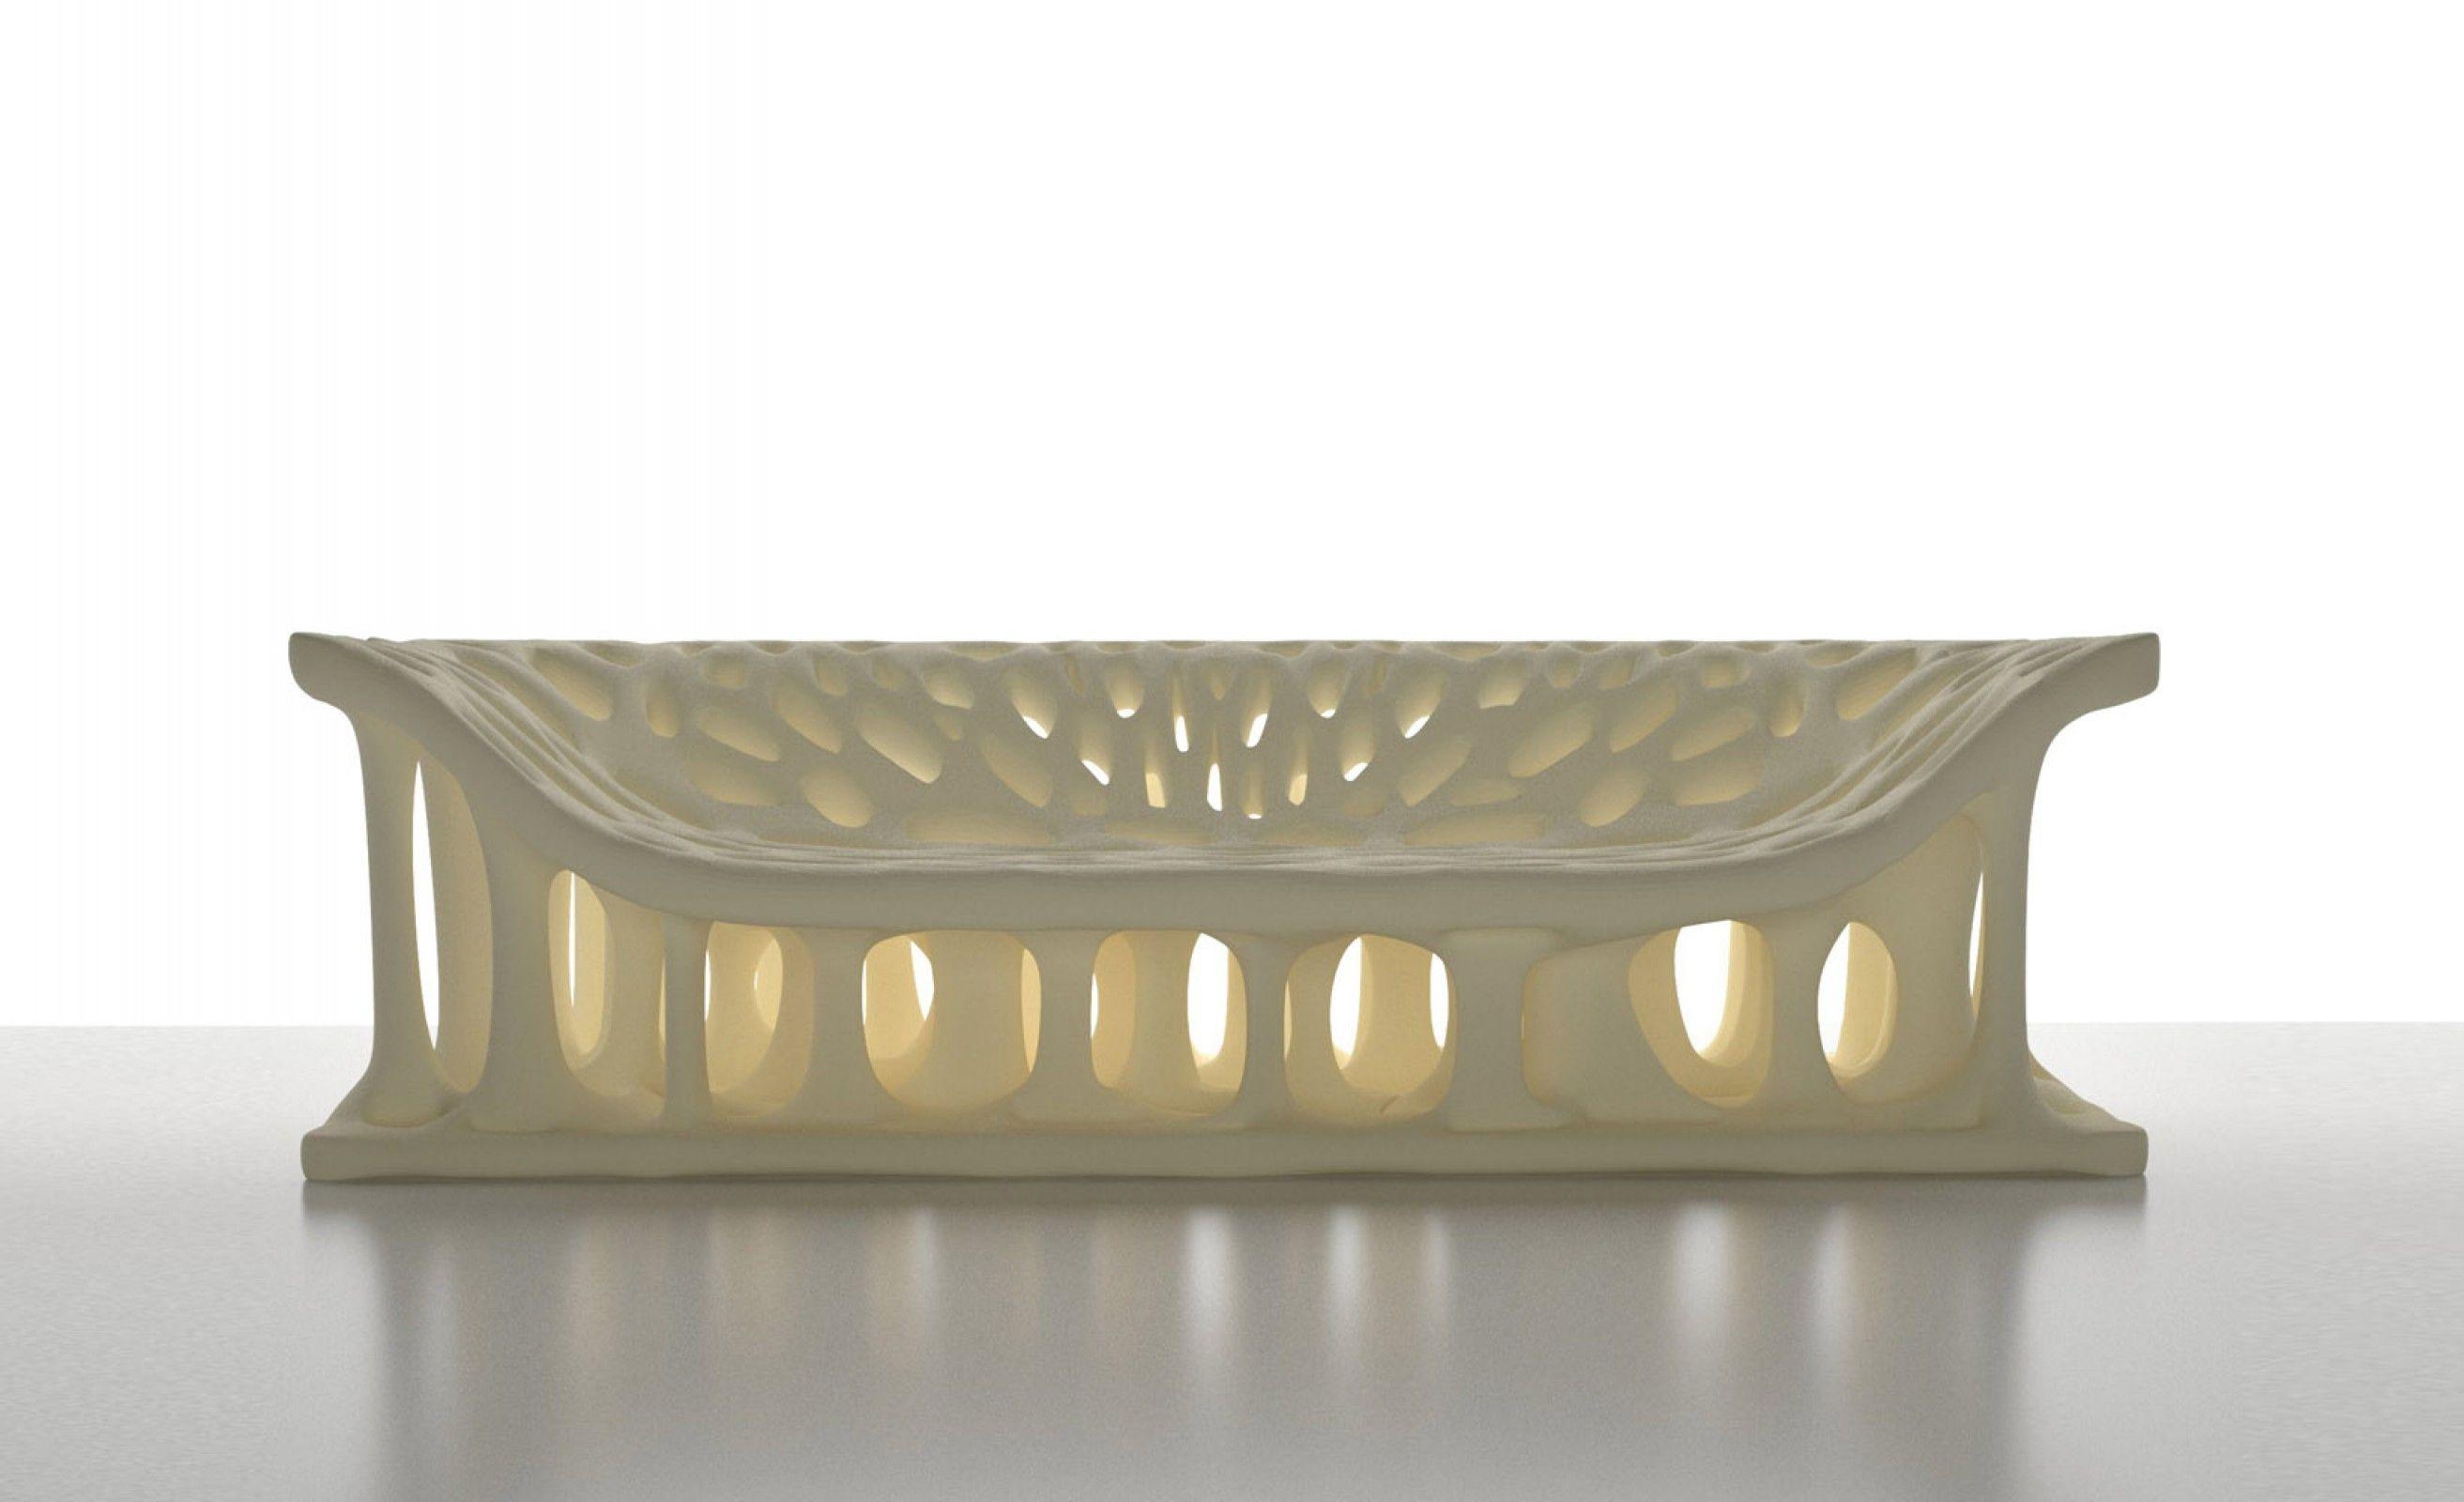 Treelike Chair Digital fabrication, Outdoor decor, 3d shape